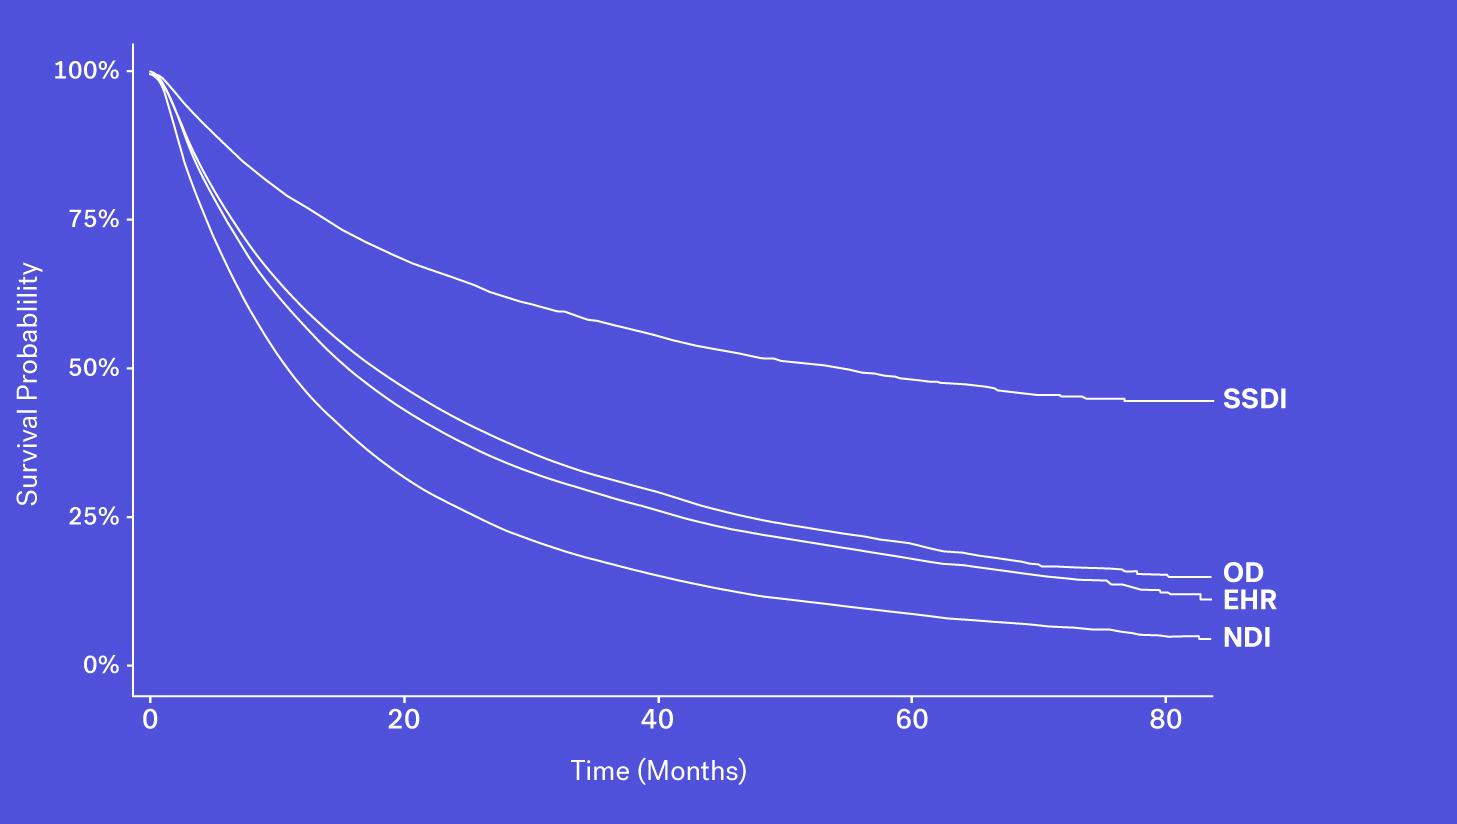 Flatiron_Mortality_Variable_EHR-mobile-02